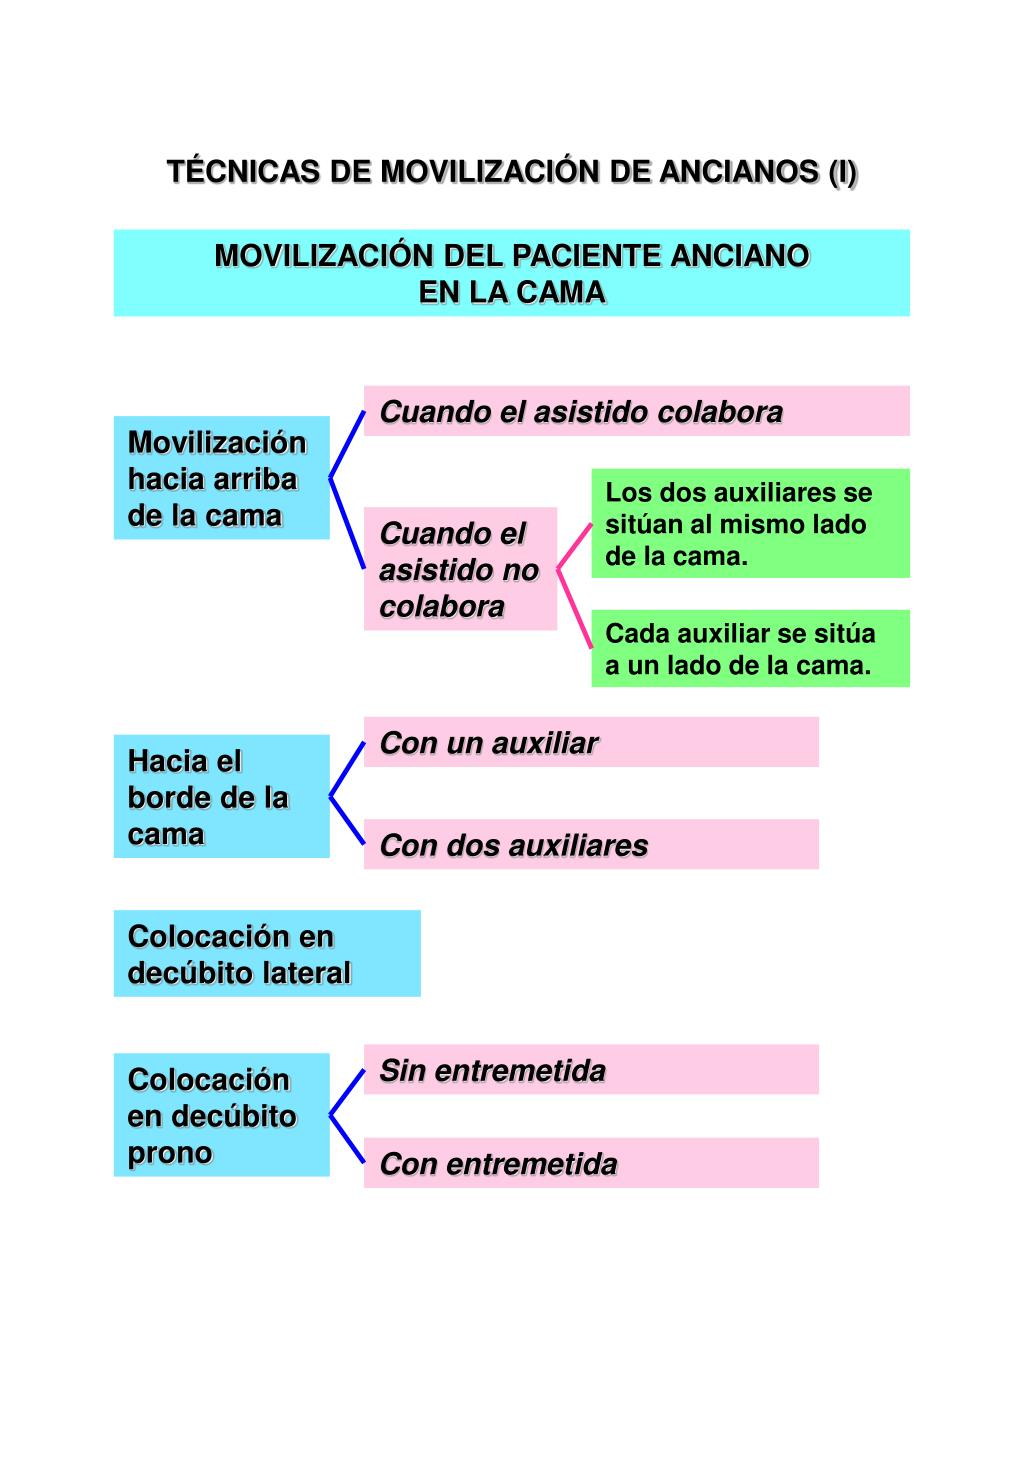 TÉCNICAS DE MOVILIZACIÓN DE ANCIANOS (I)